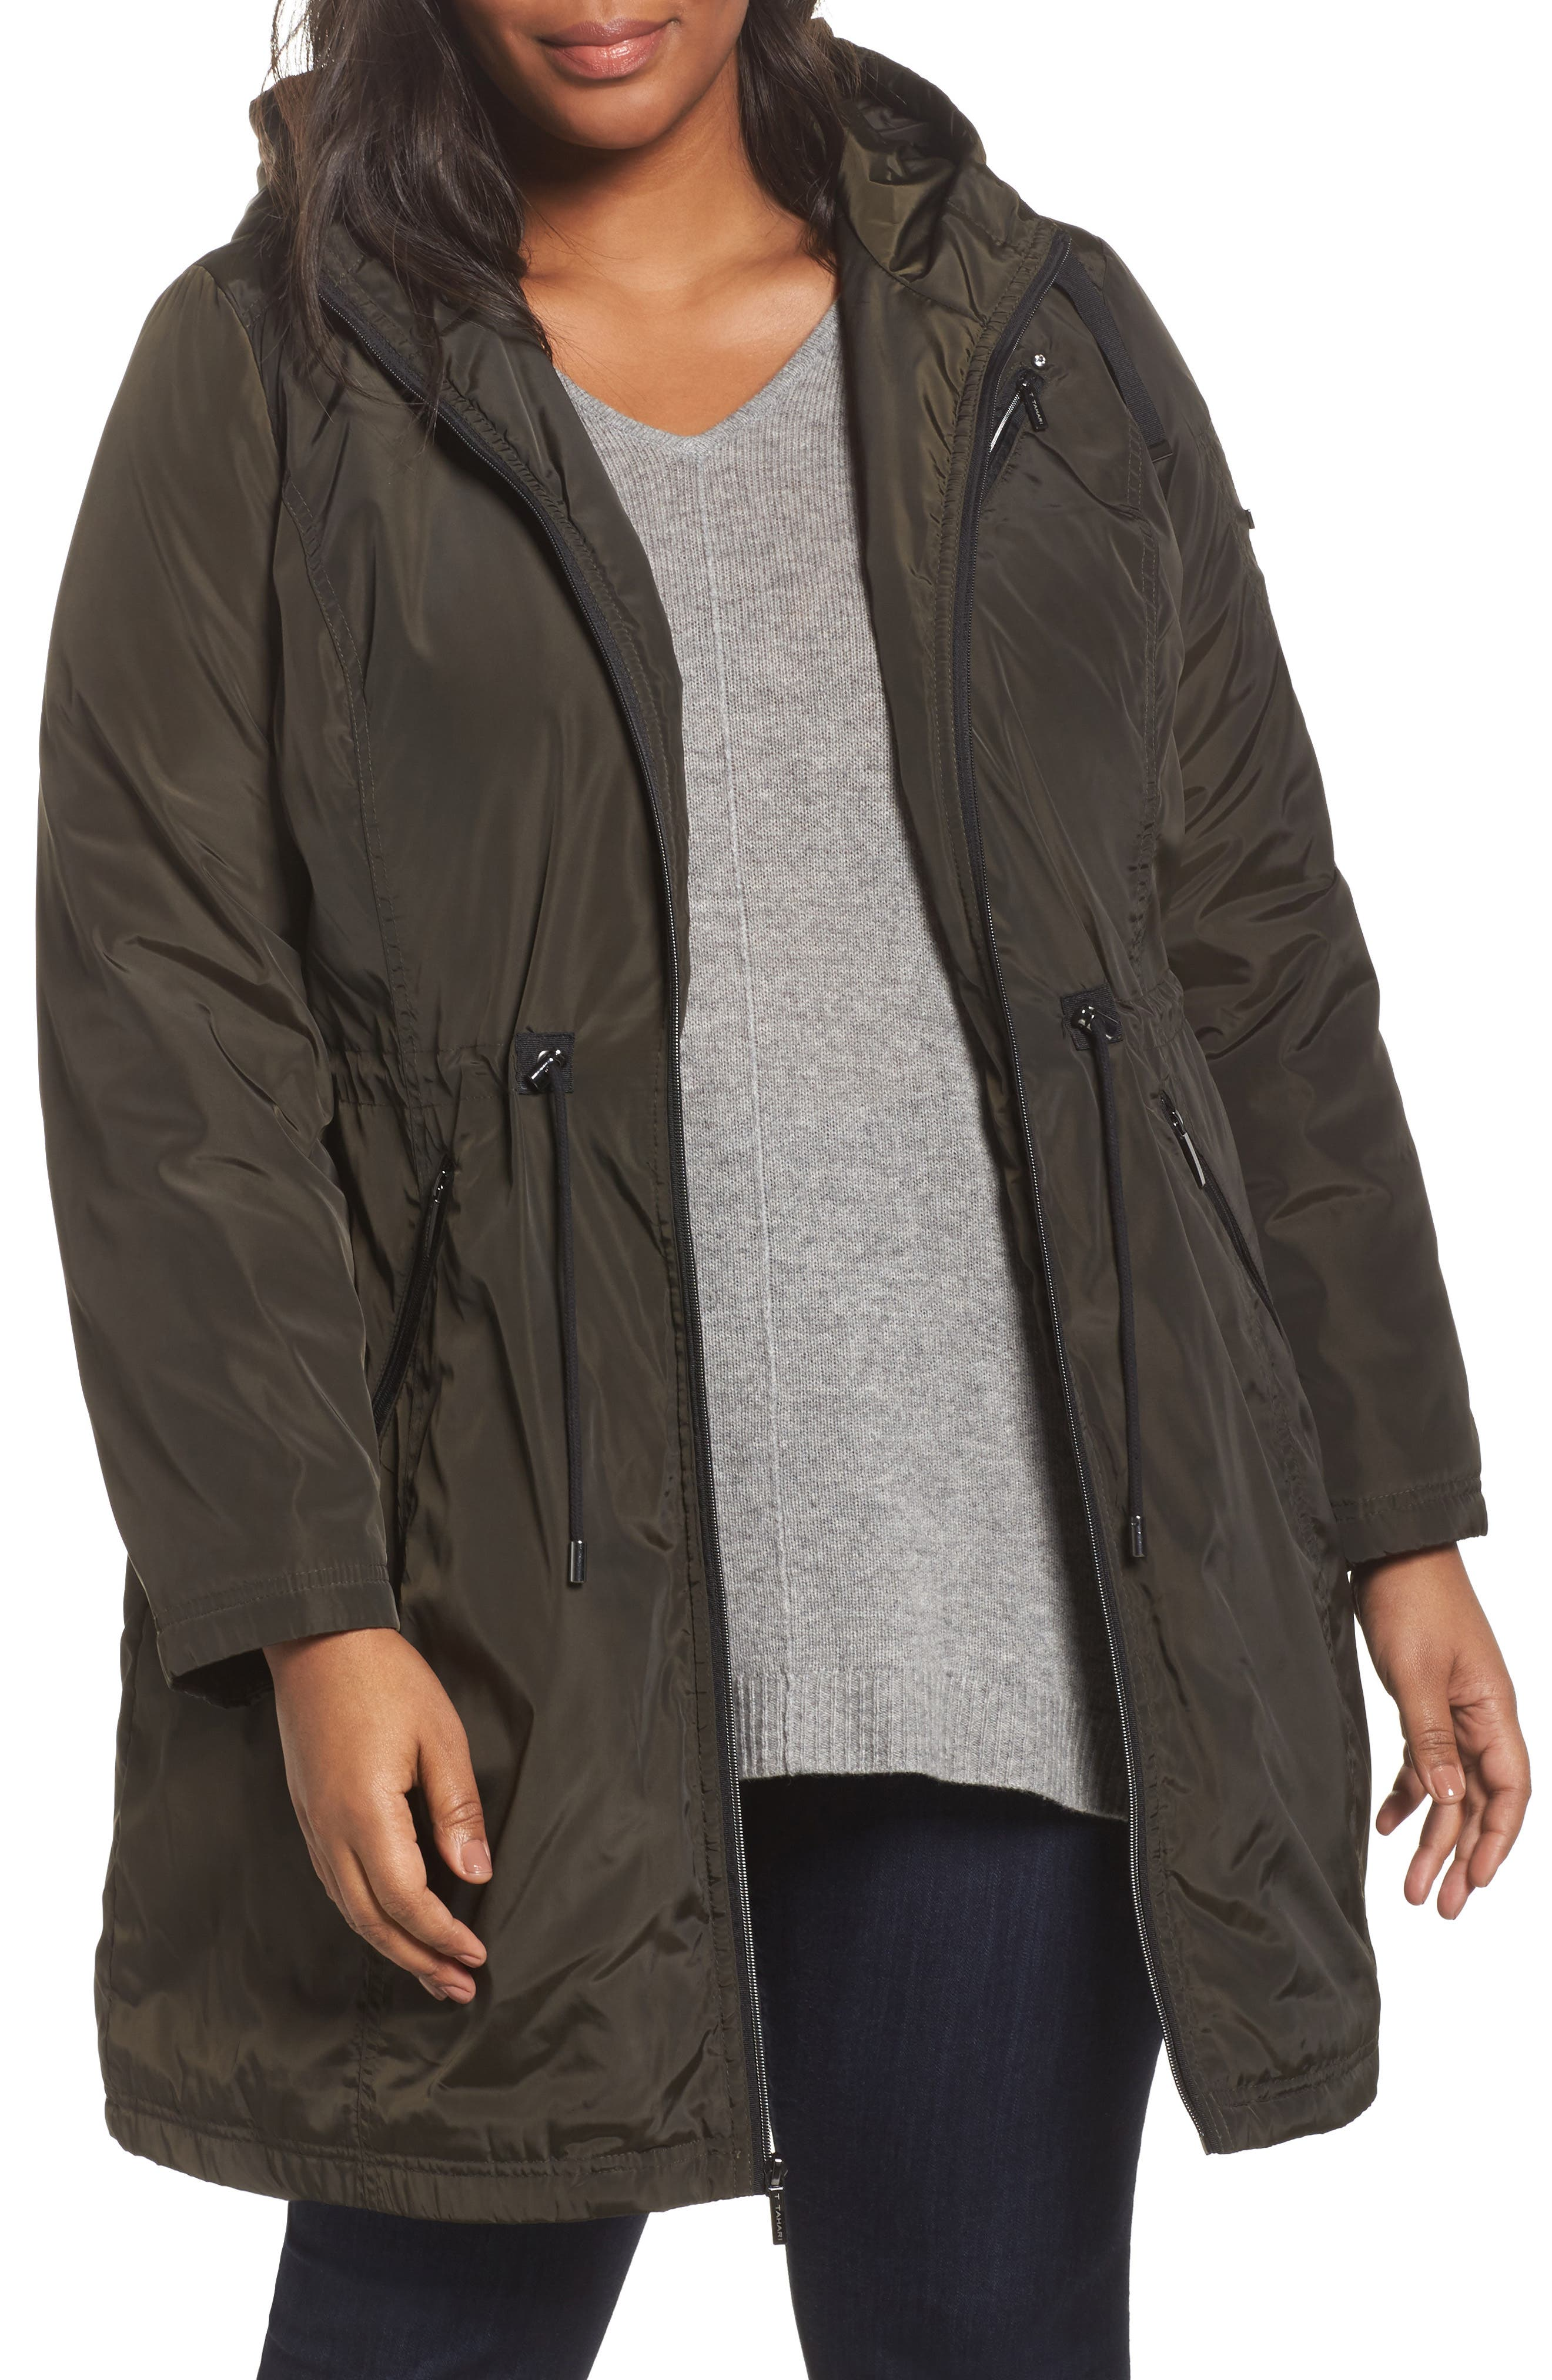 Tiffany Raincoat,                             Main thumbnail 1, color,                             Olive